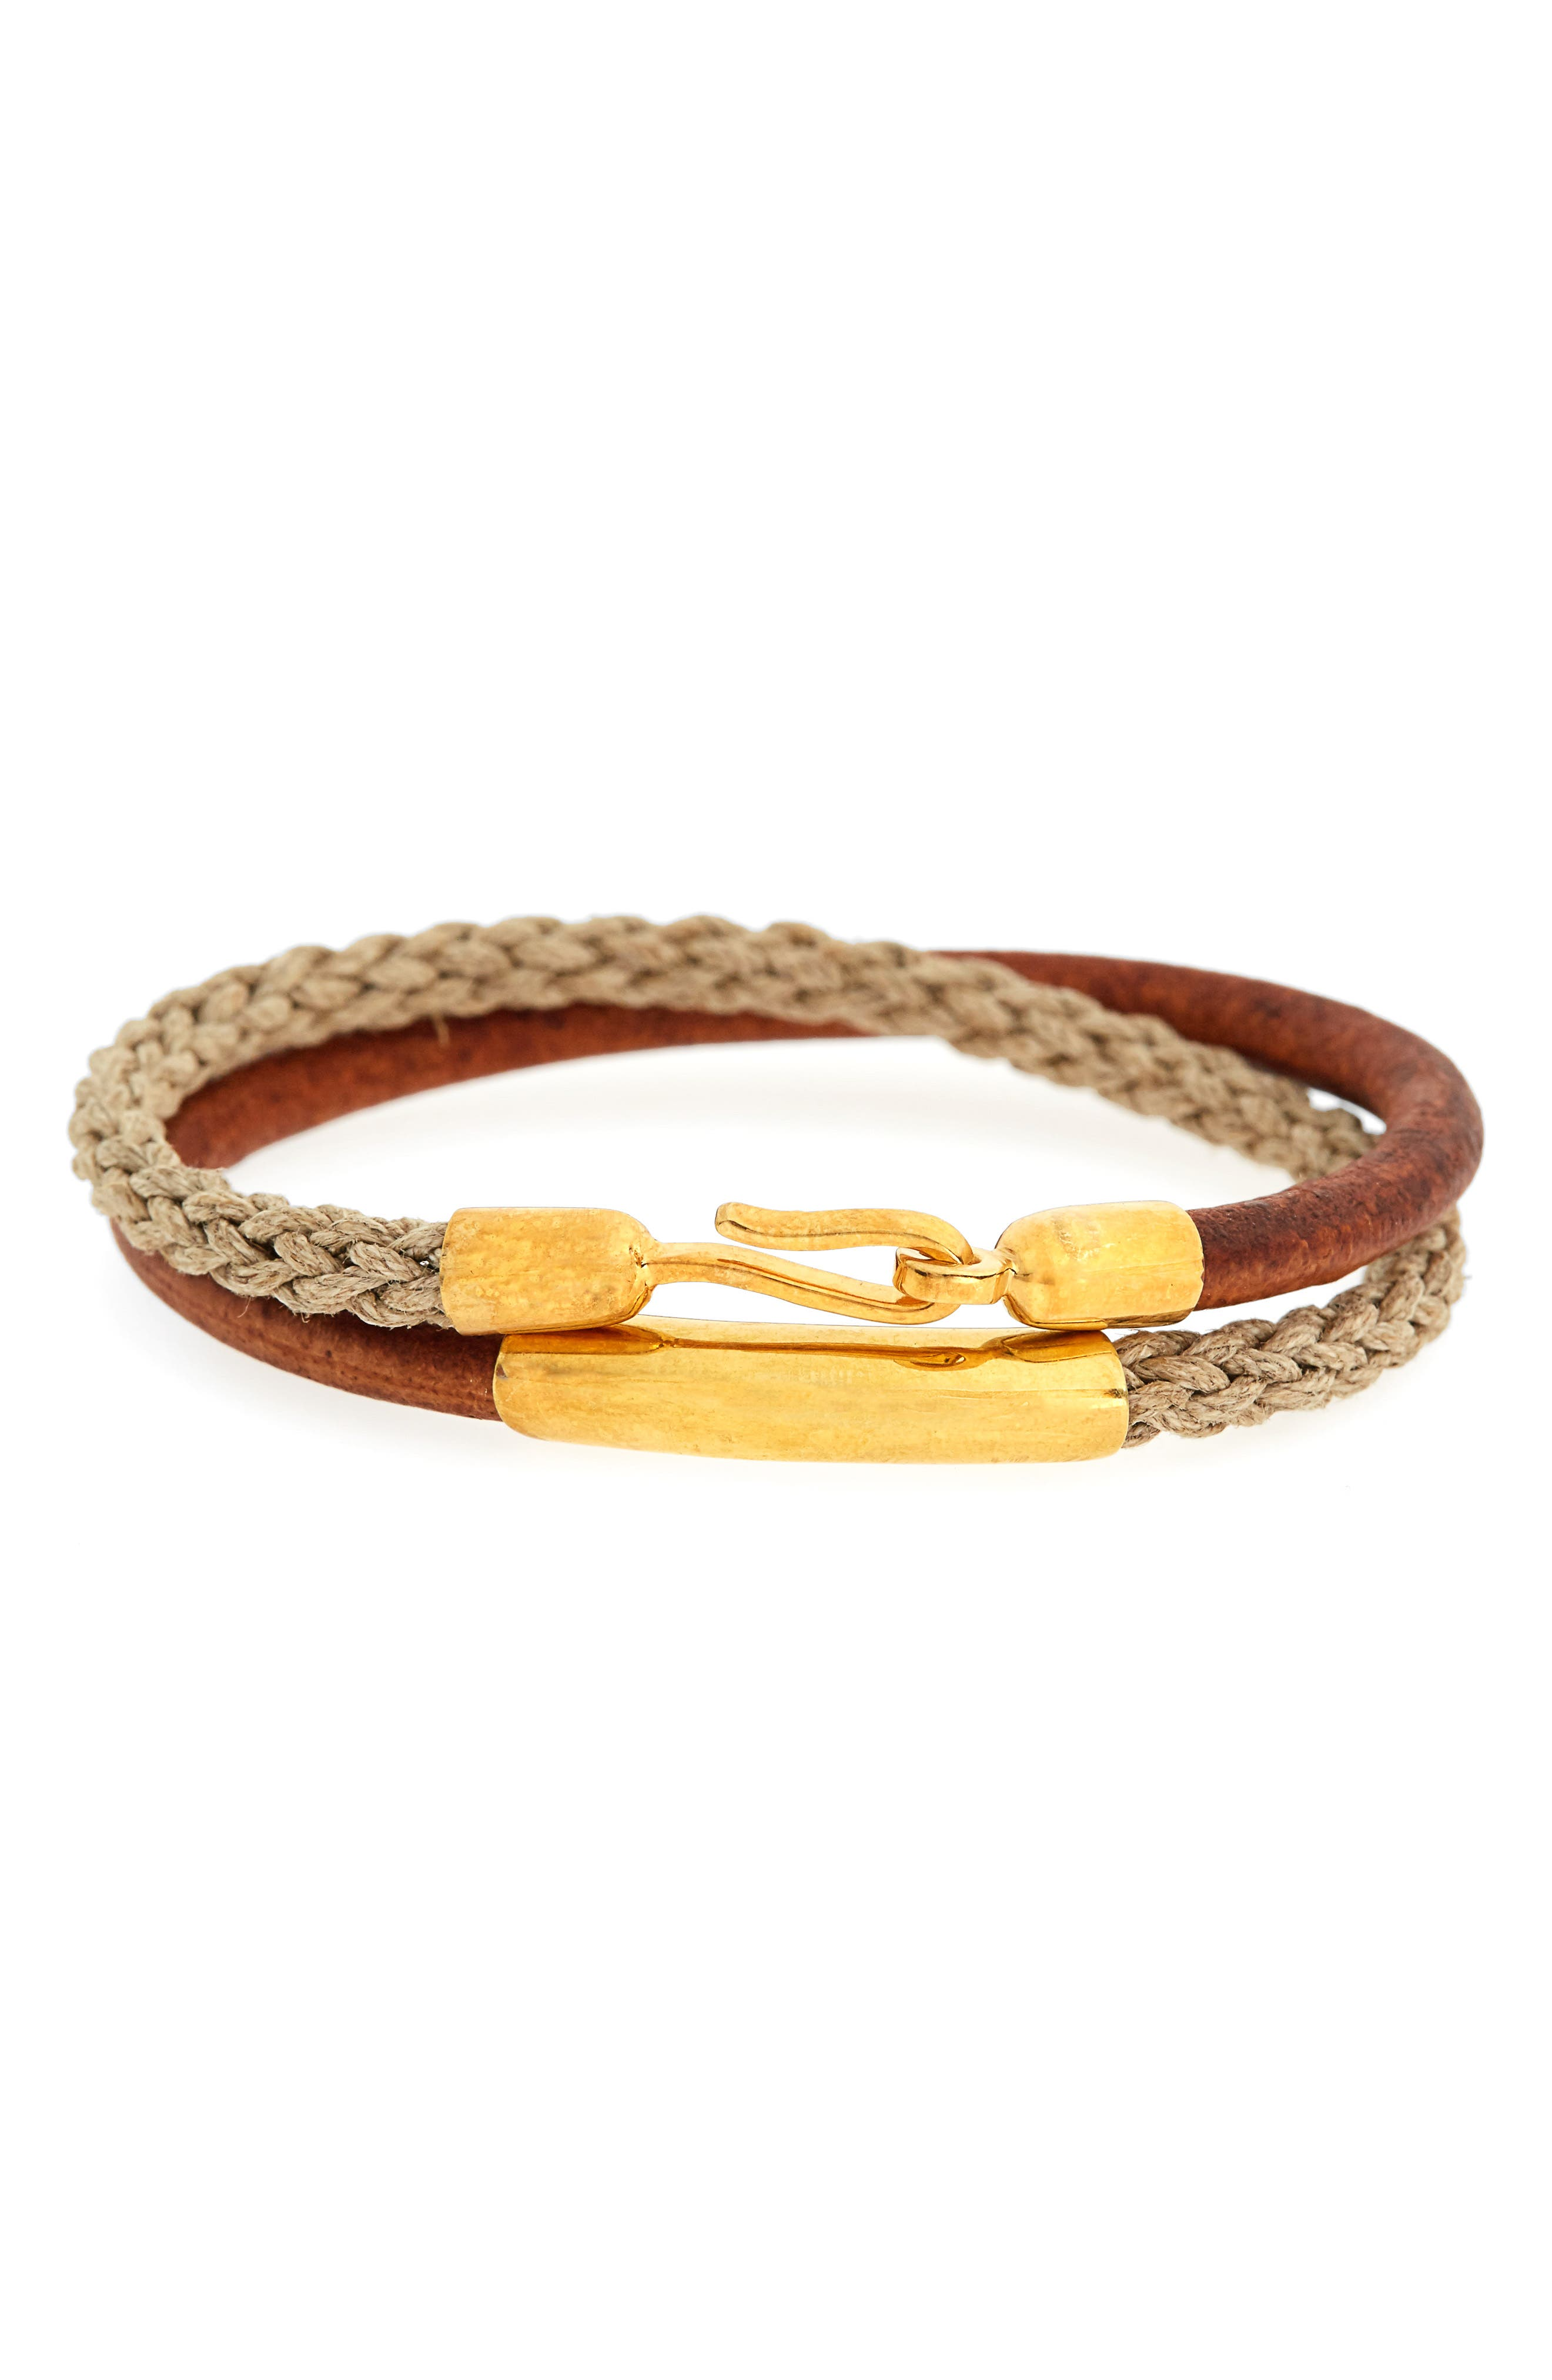 Leather & Jute Wrap Bracelet,                         Main,                         color, Tan